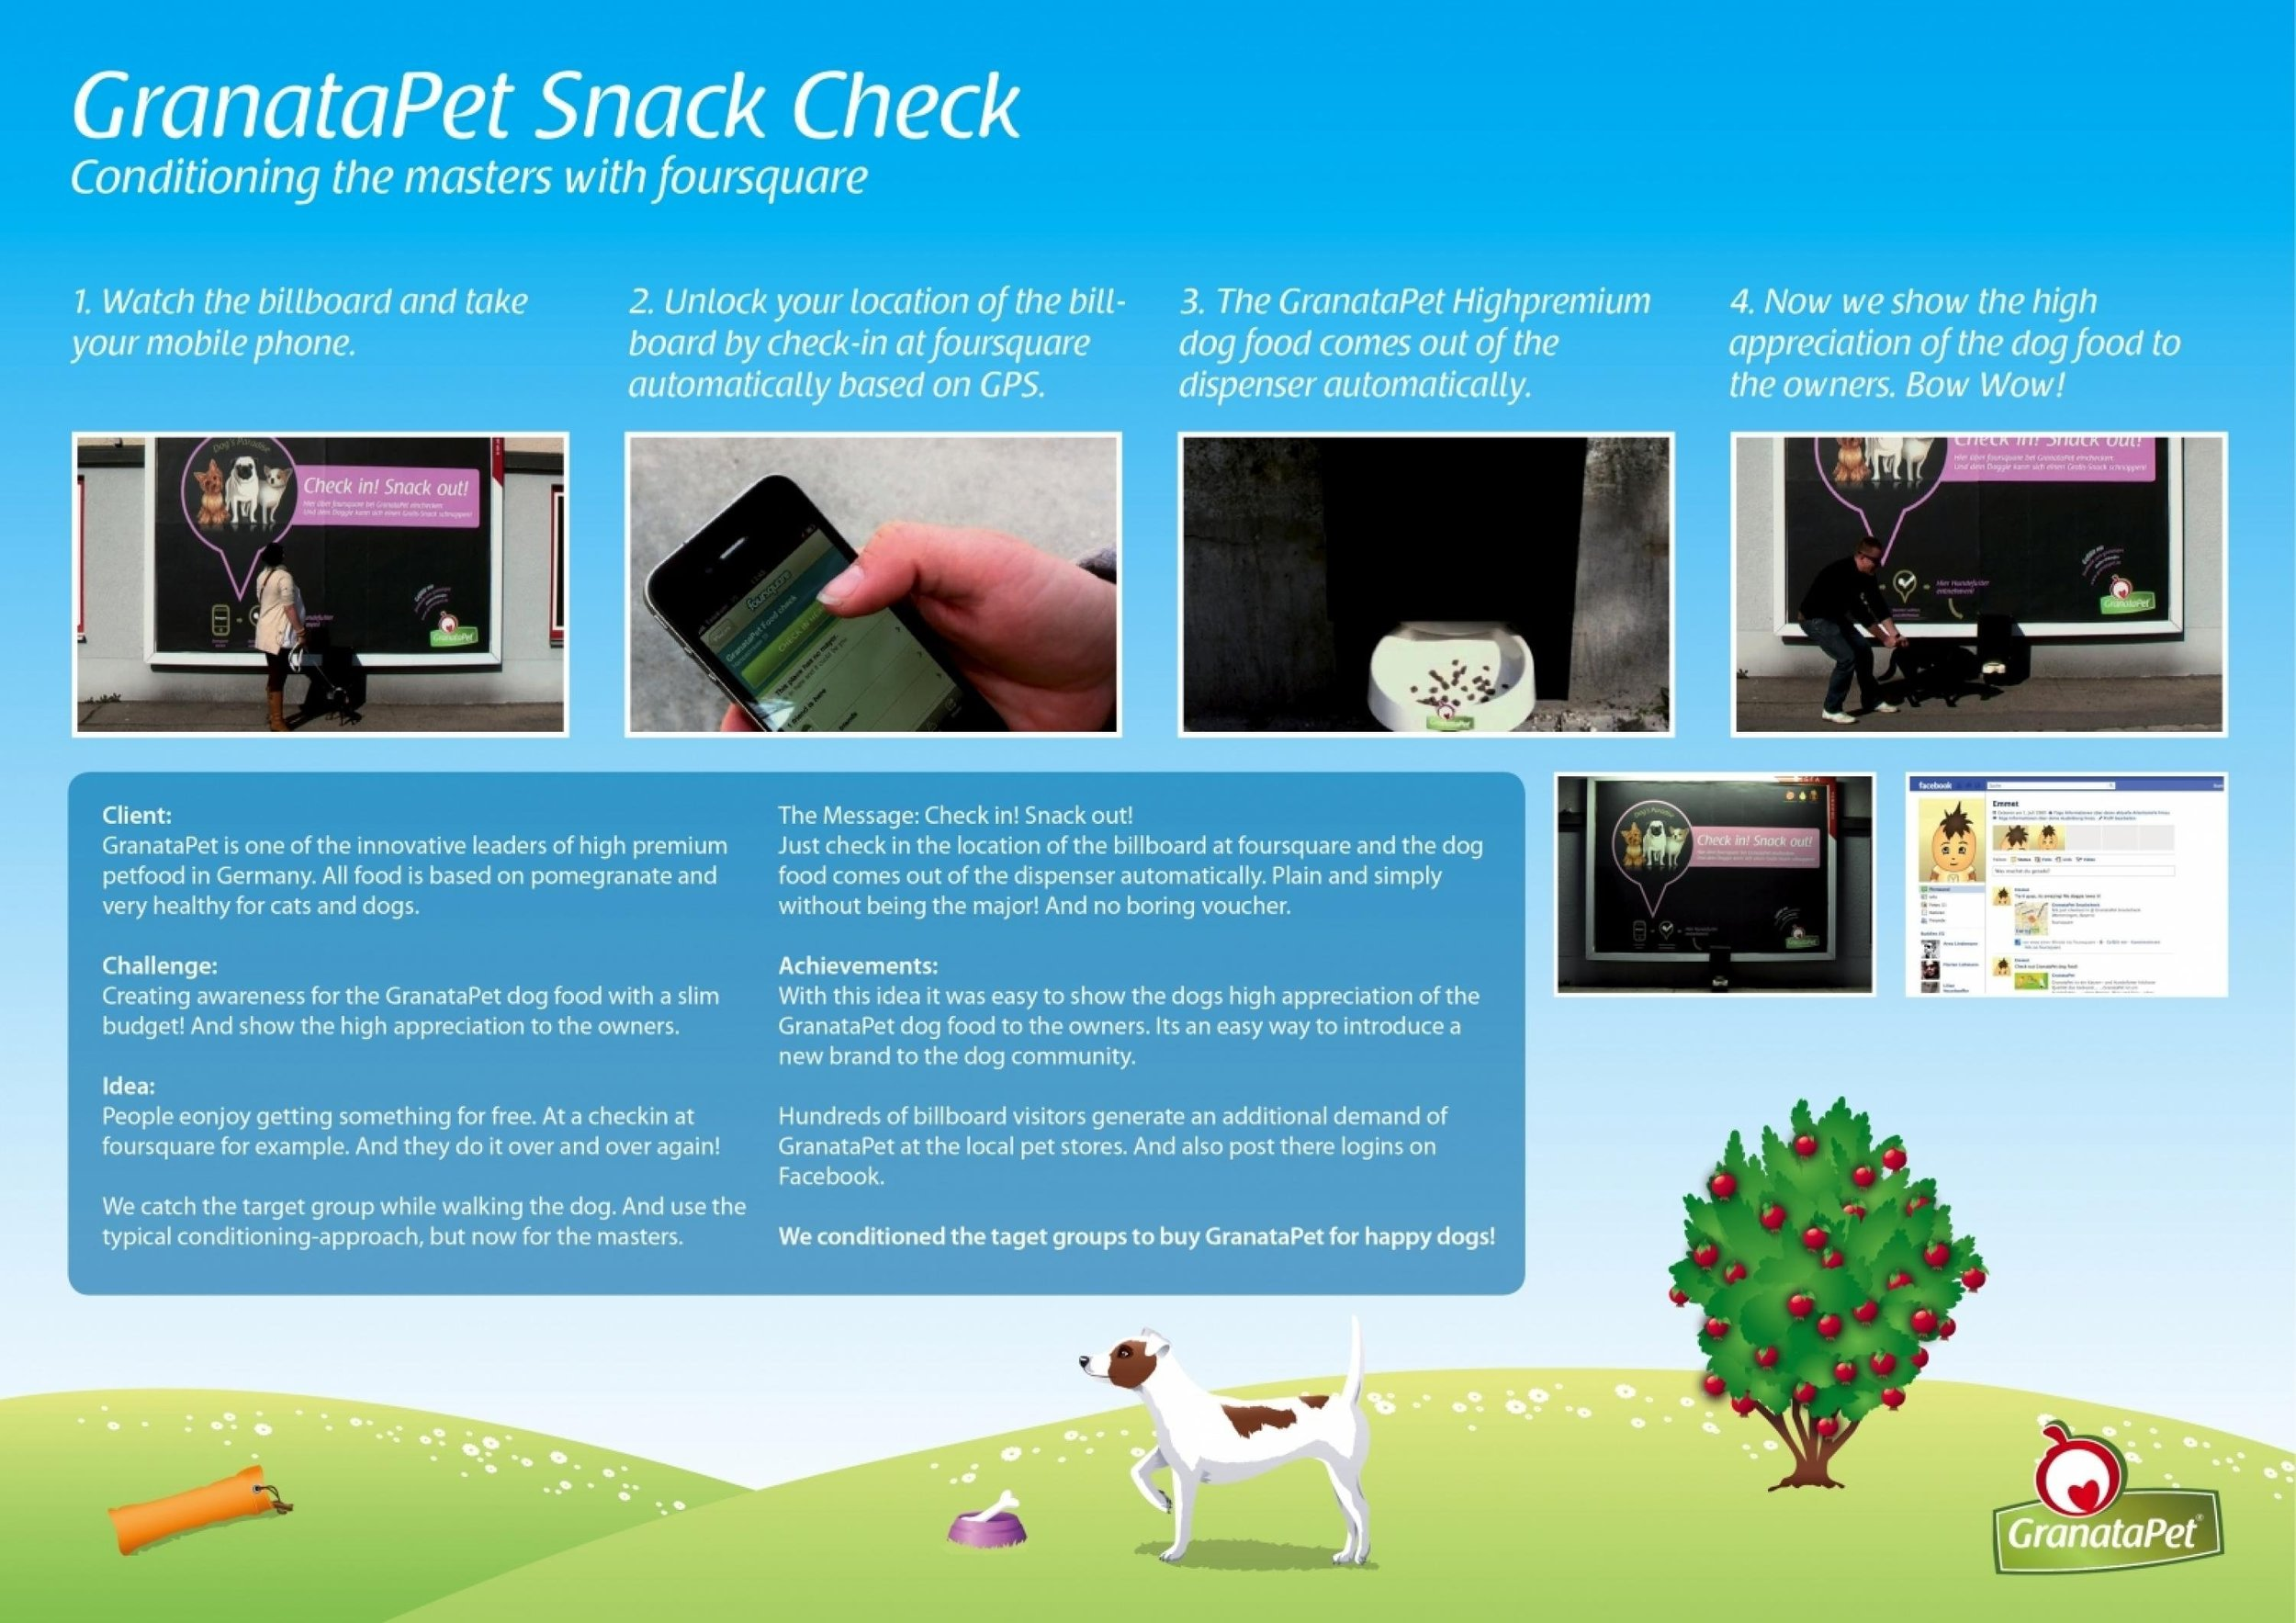 snack-check-board.jpg